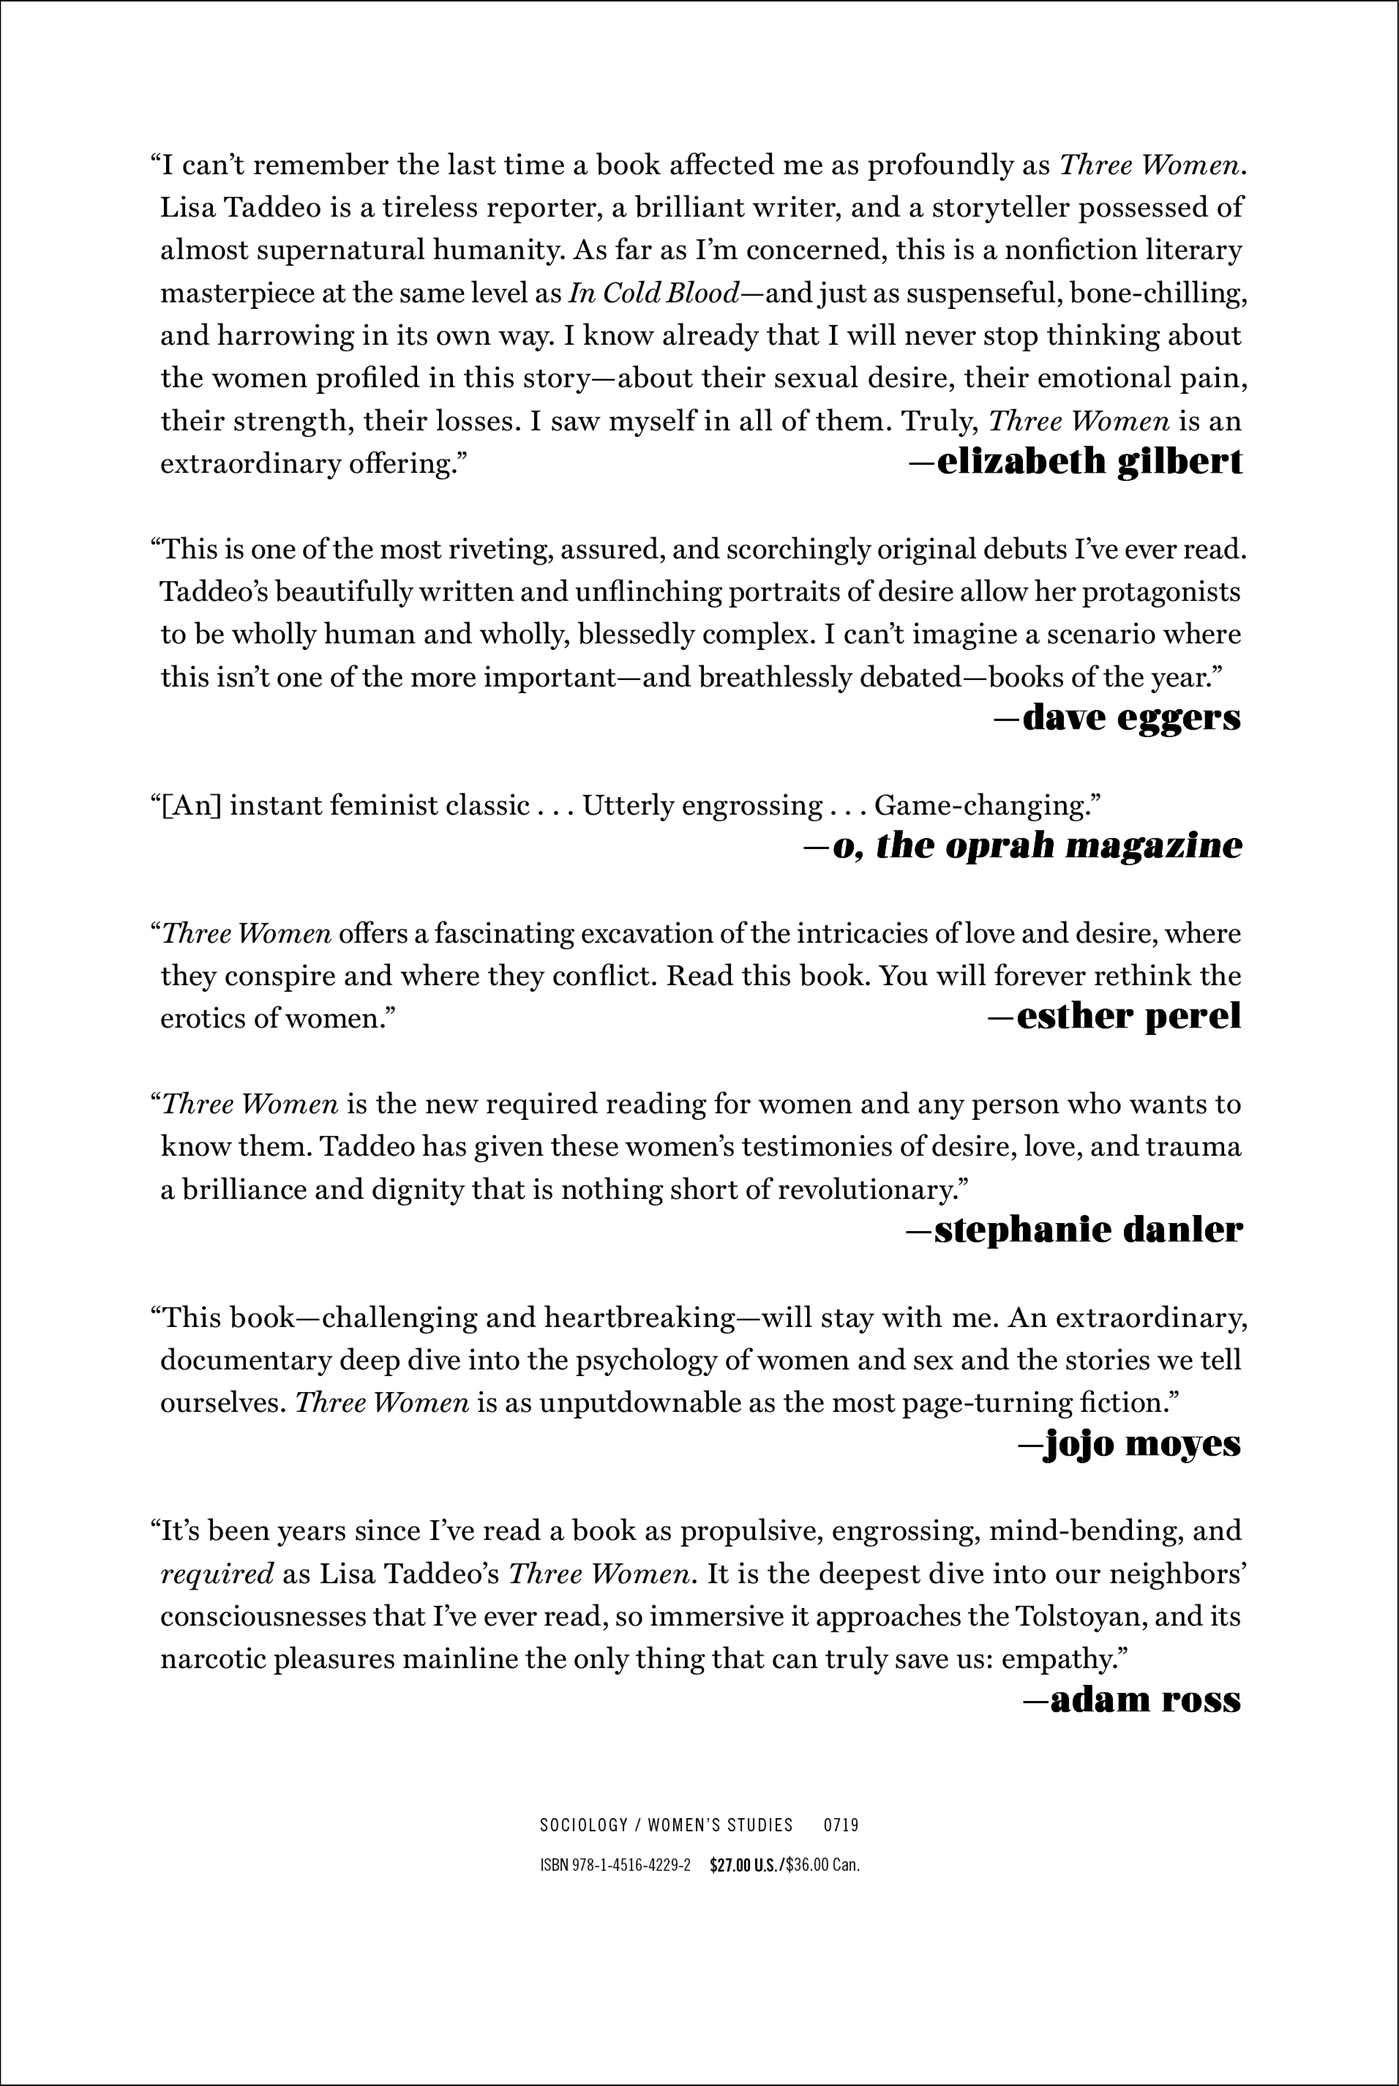 Amazon.com: Three Women (9781451642292): Lisa Taddeo: Books